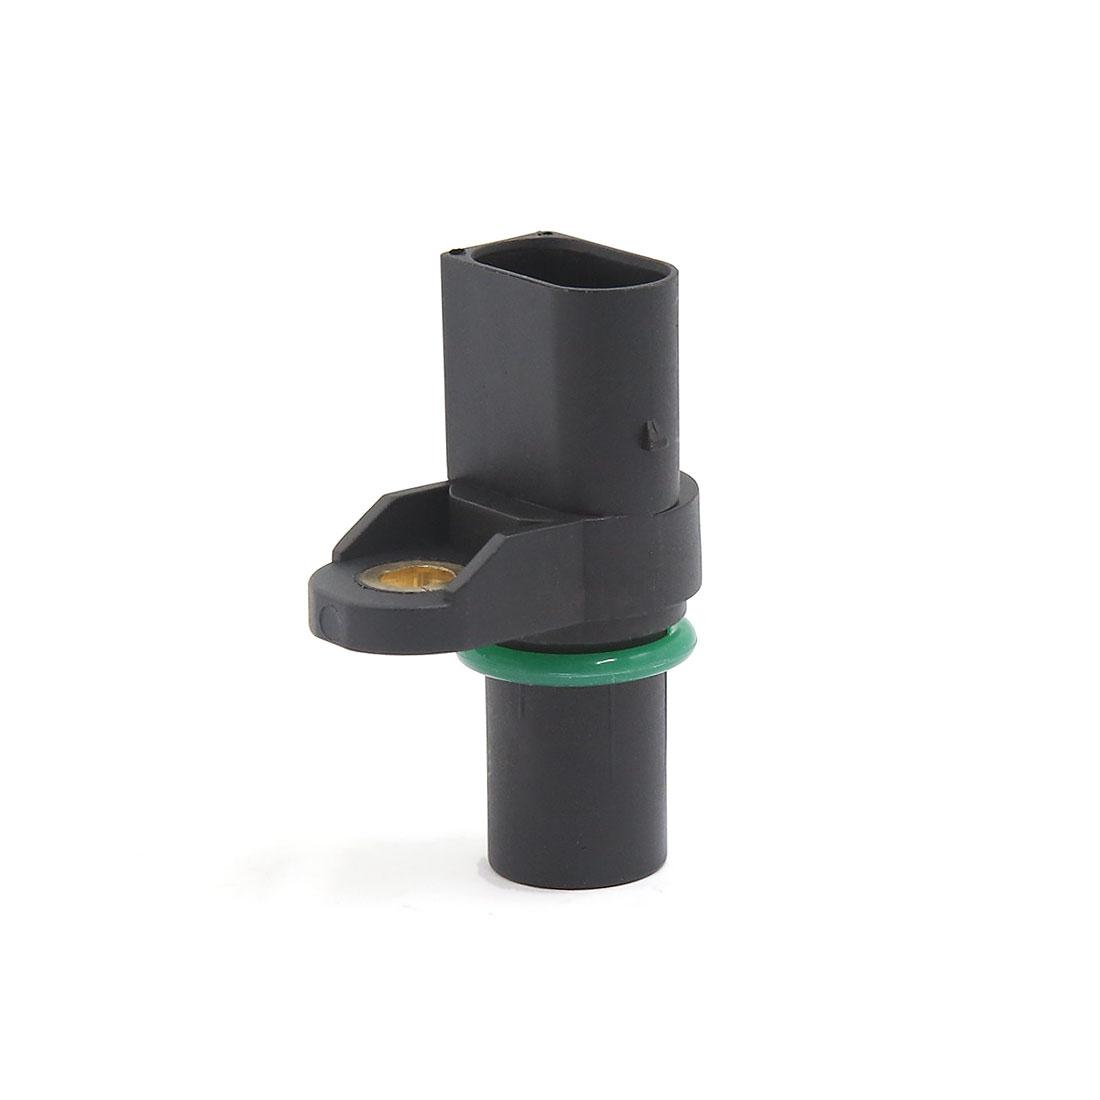 12 14 7 518 628 Camshaft Position Sensor Fits E46 X5 E39 Z4 Z3 X3 E53 E60 E85